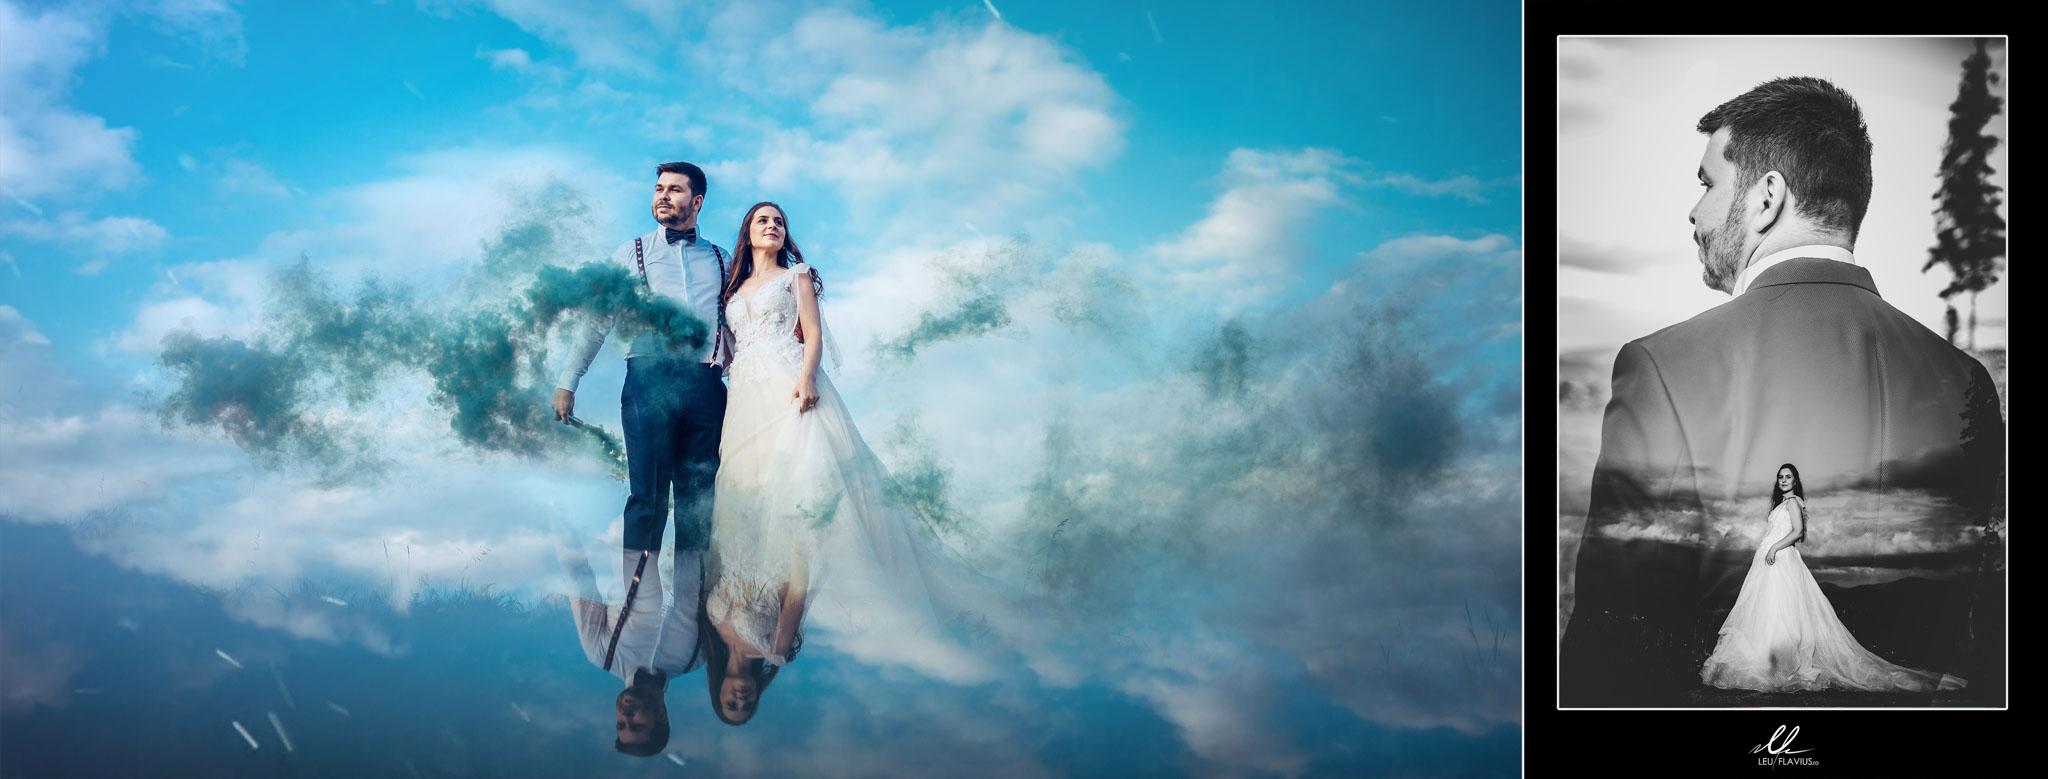 Colaj 06 - Trash the Dress - Cosmina si Ionut